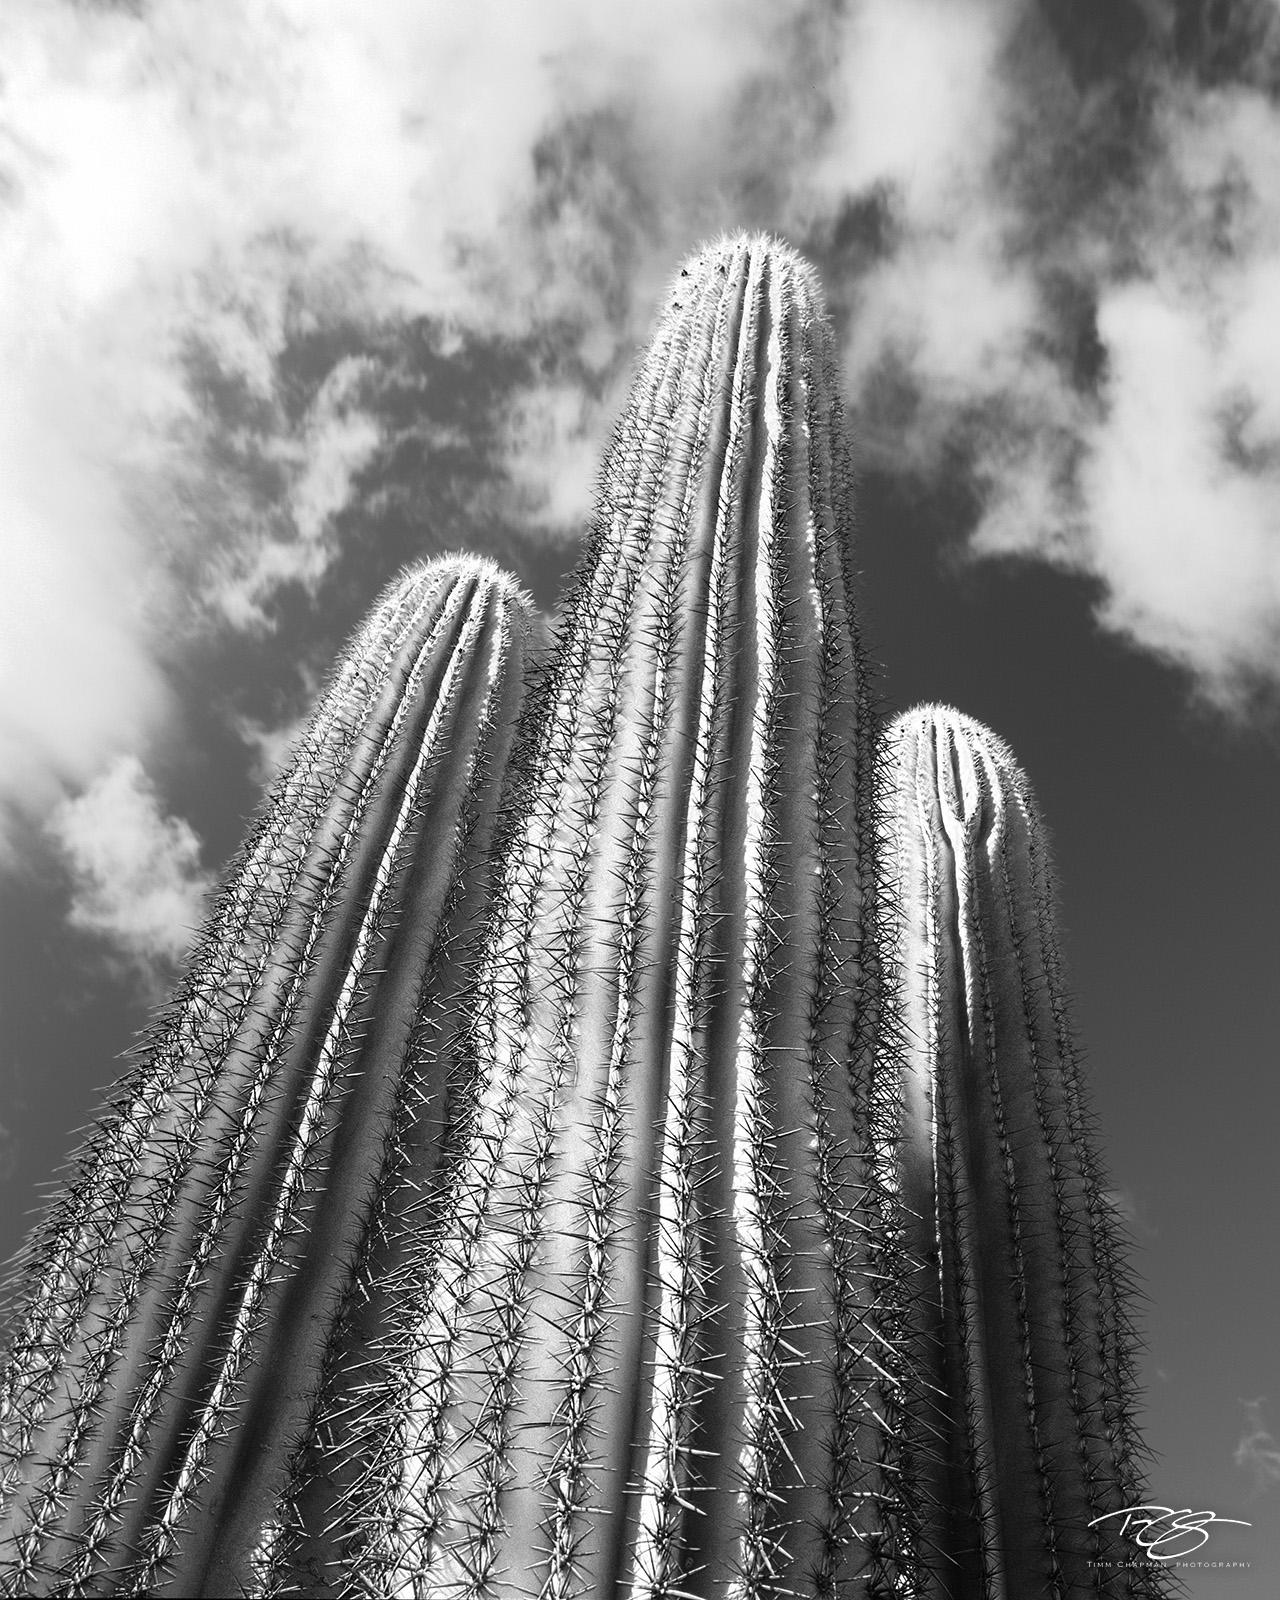 Giant Saguaro Cacti reach for the heavens